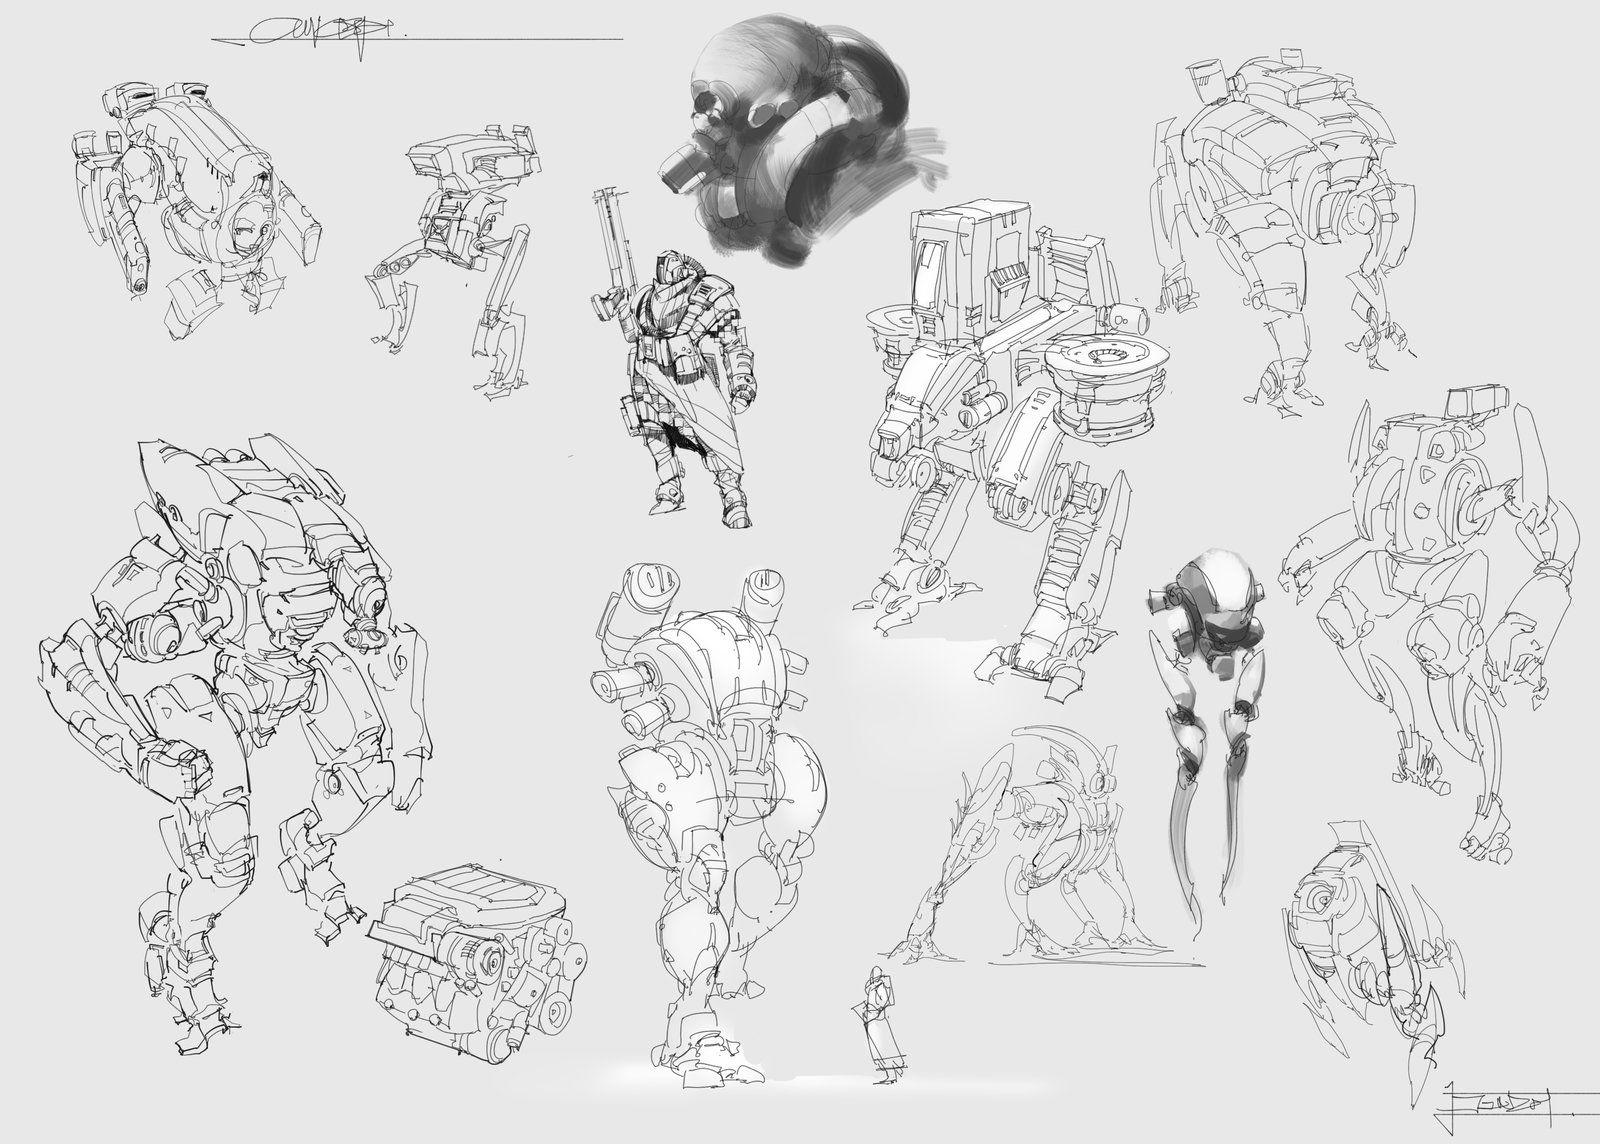 Concept, Ray Jin on ArtStation at https://www.artstation